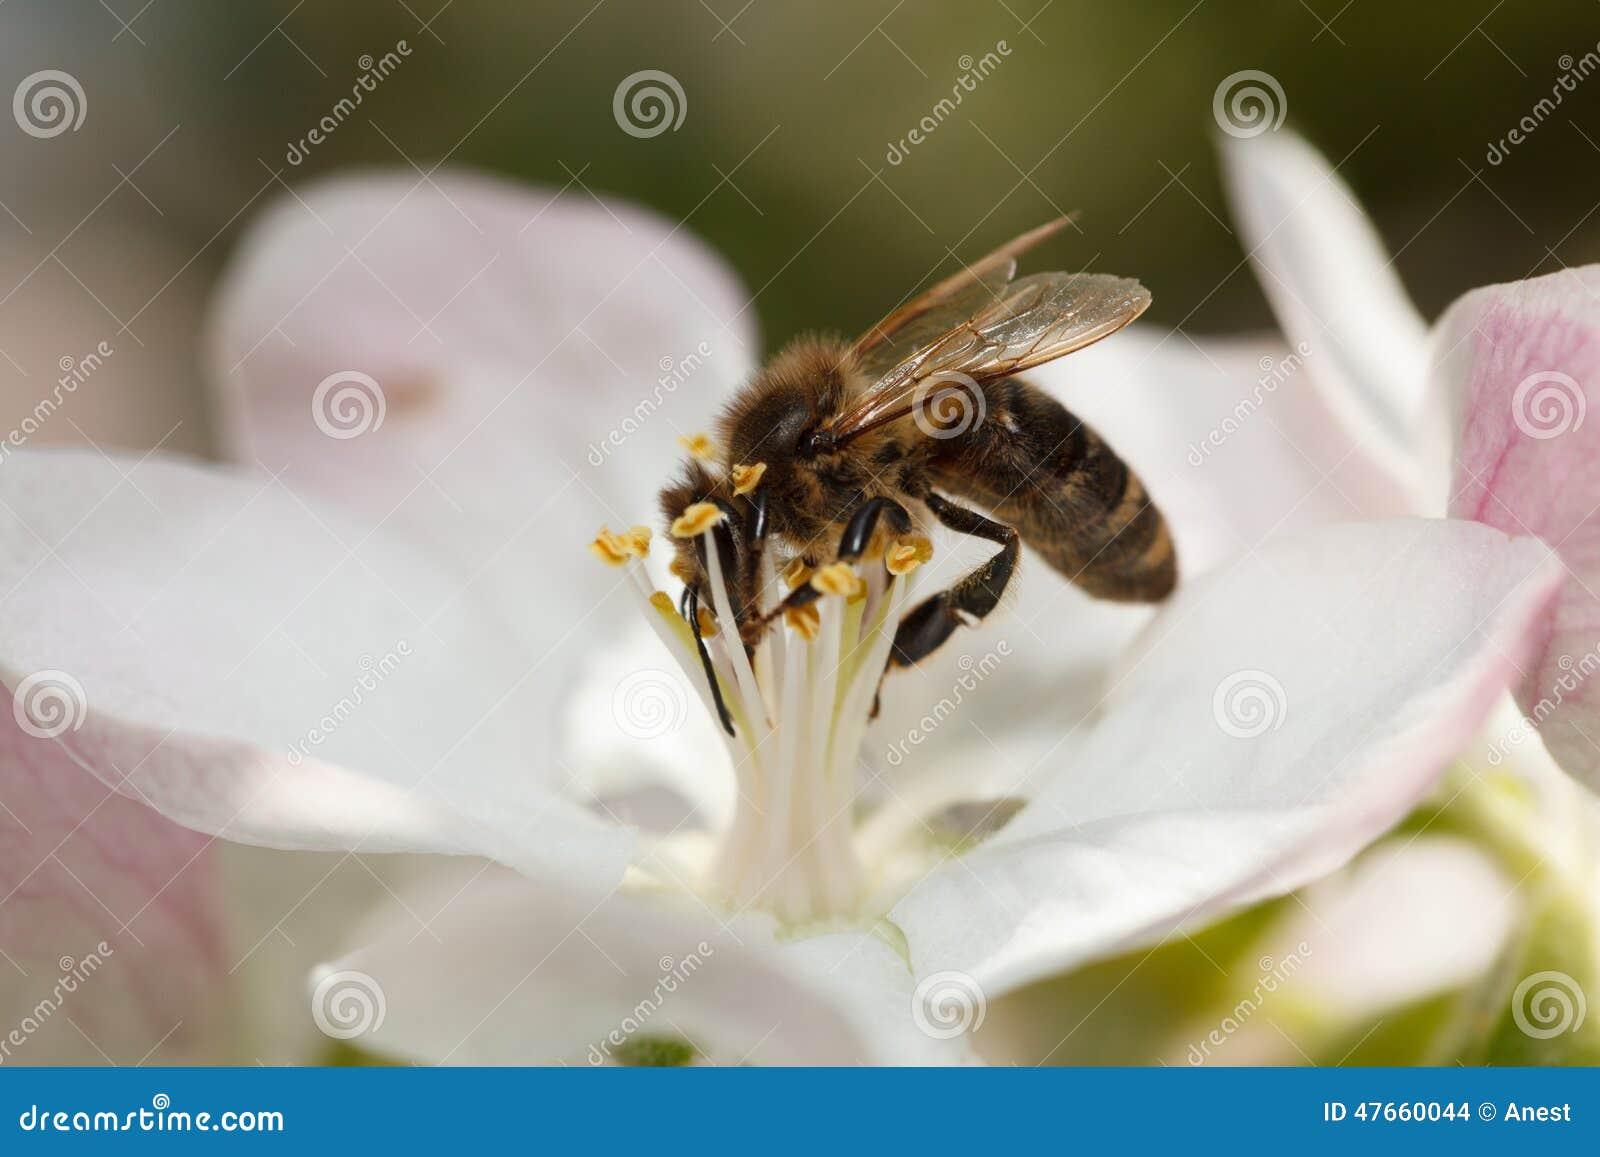 Bee Drinking Nectar On Apple Flower Stock Photo - Image of